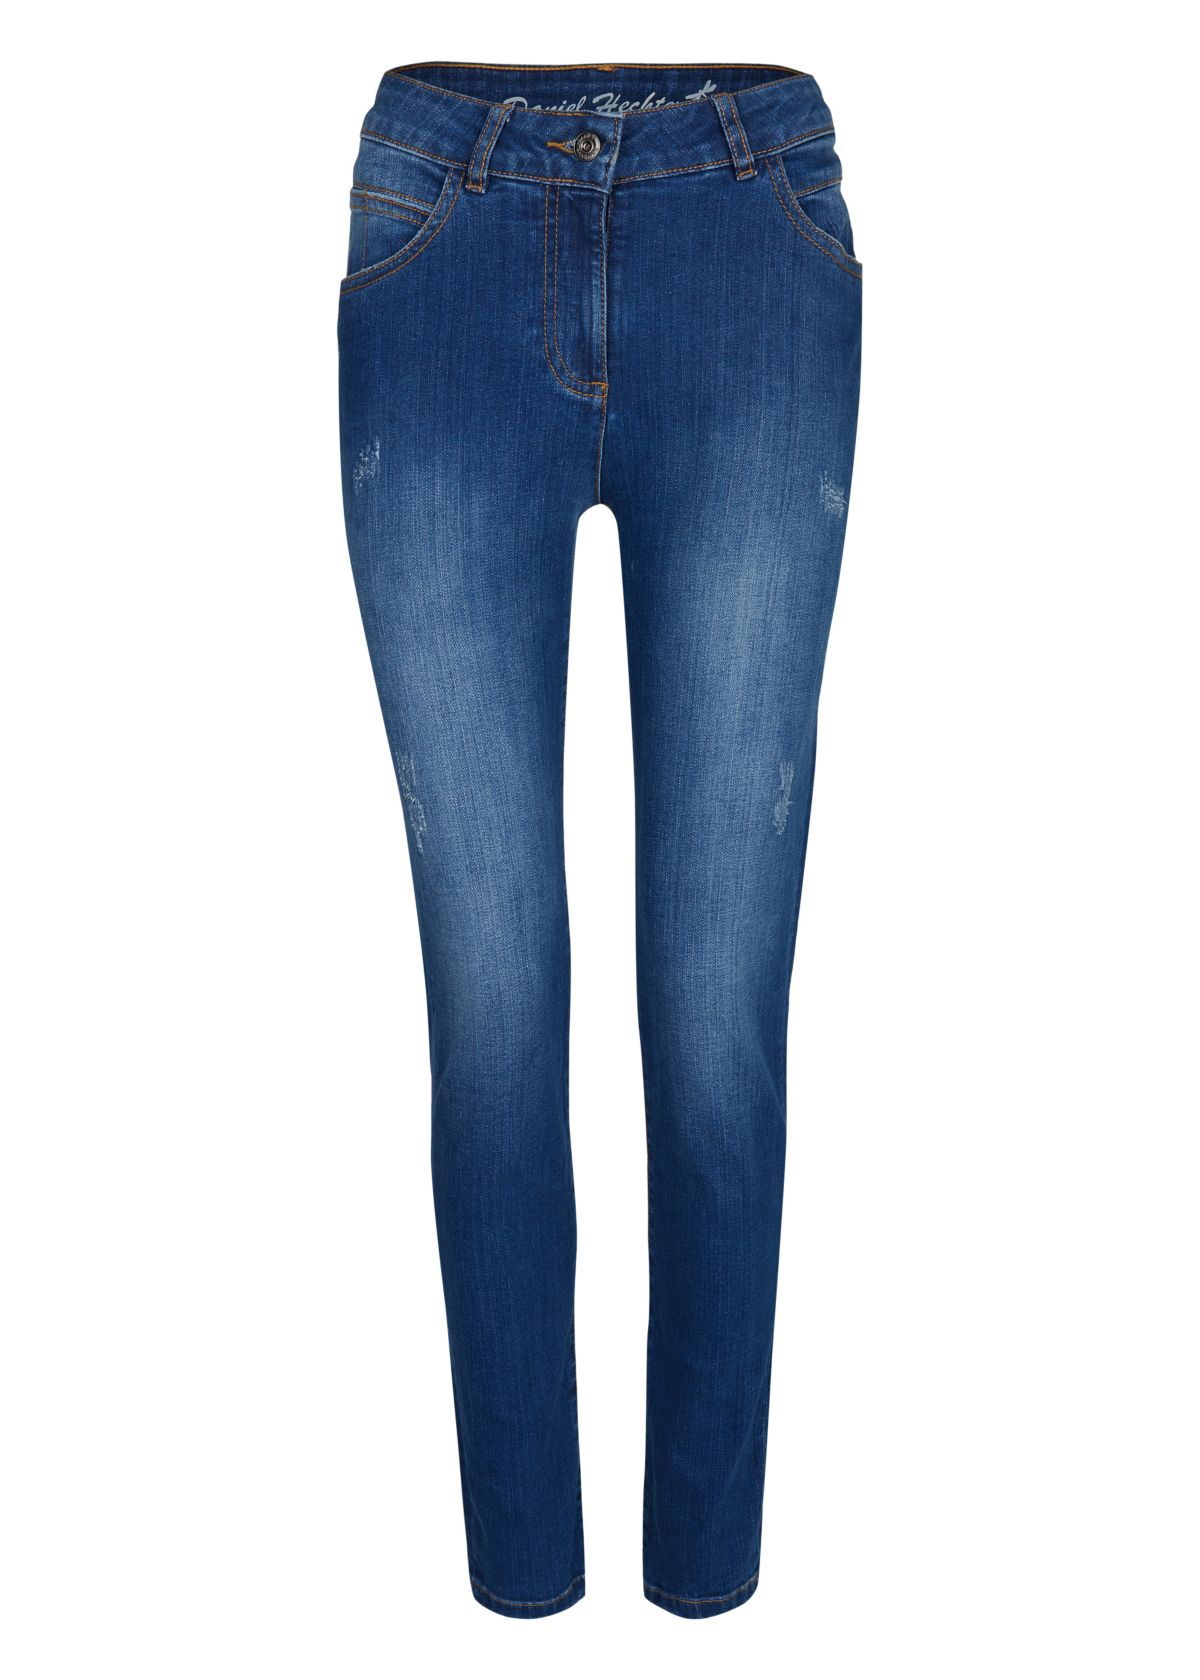 Daniel Hechter Bequeme Jeans im 5 Pocket-Style